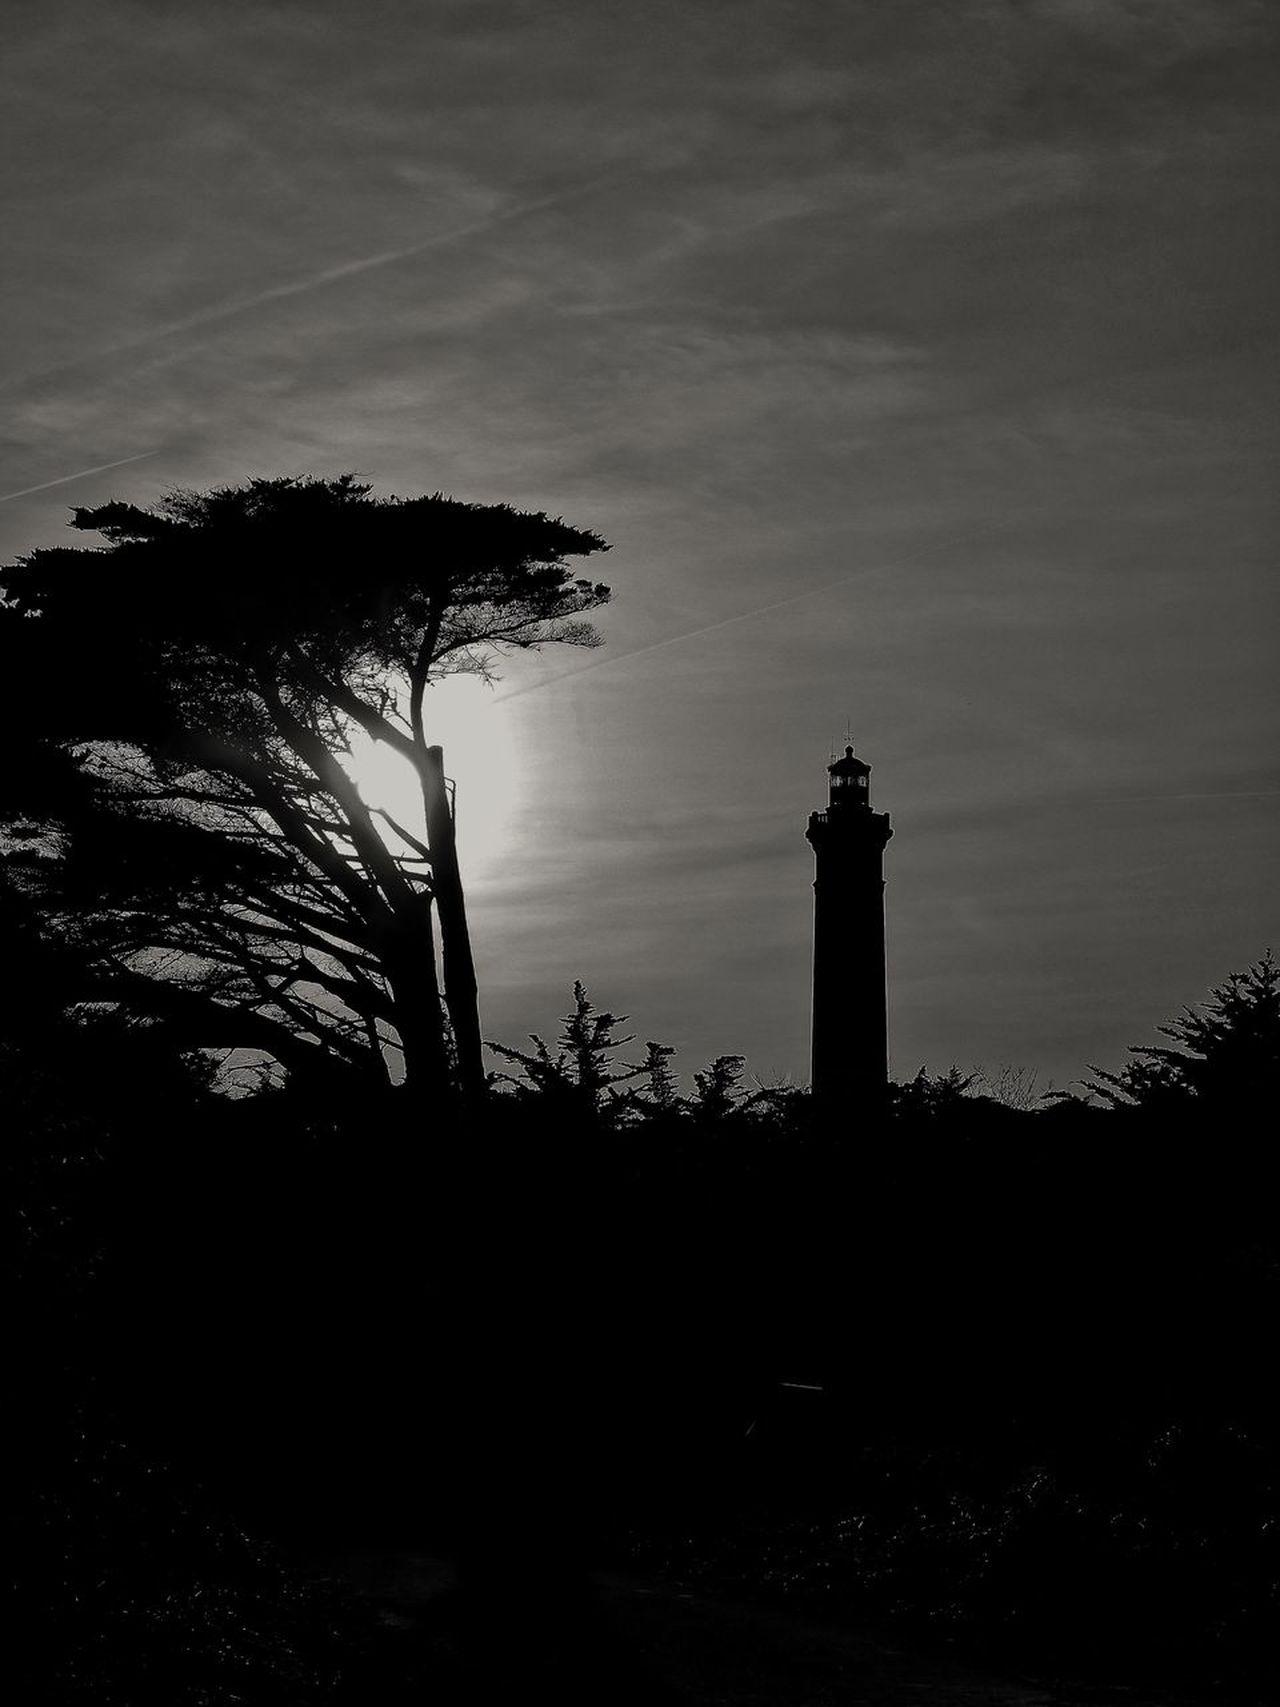 Blackandwhite Ile De Ré Saint Clément Des Baleines Phare Des Baleines Lighthouse No People Tree Nature Lighthouse Sky Silhouette Architecture Outdoors Beauty In Nature Day